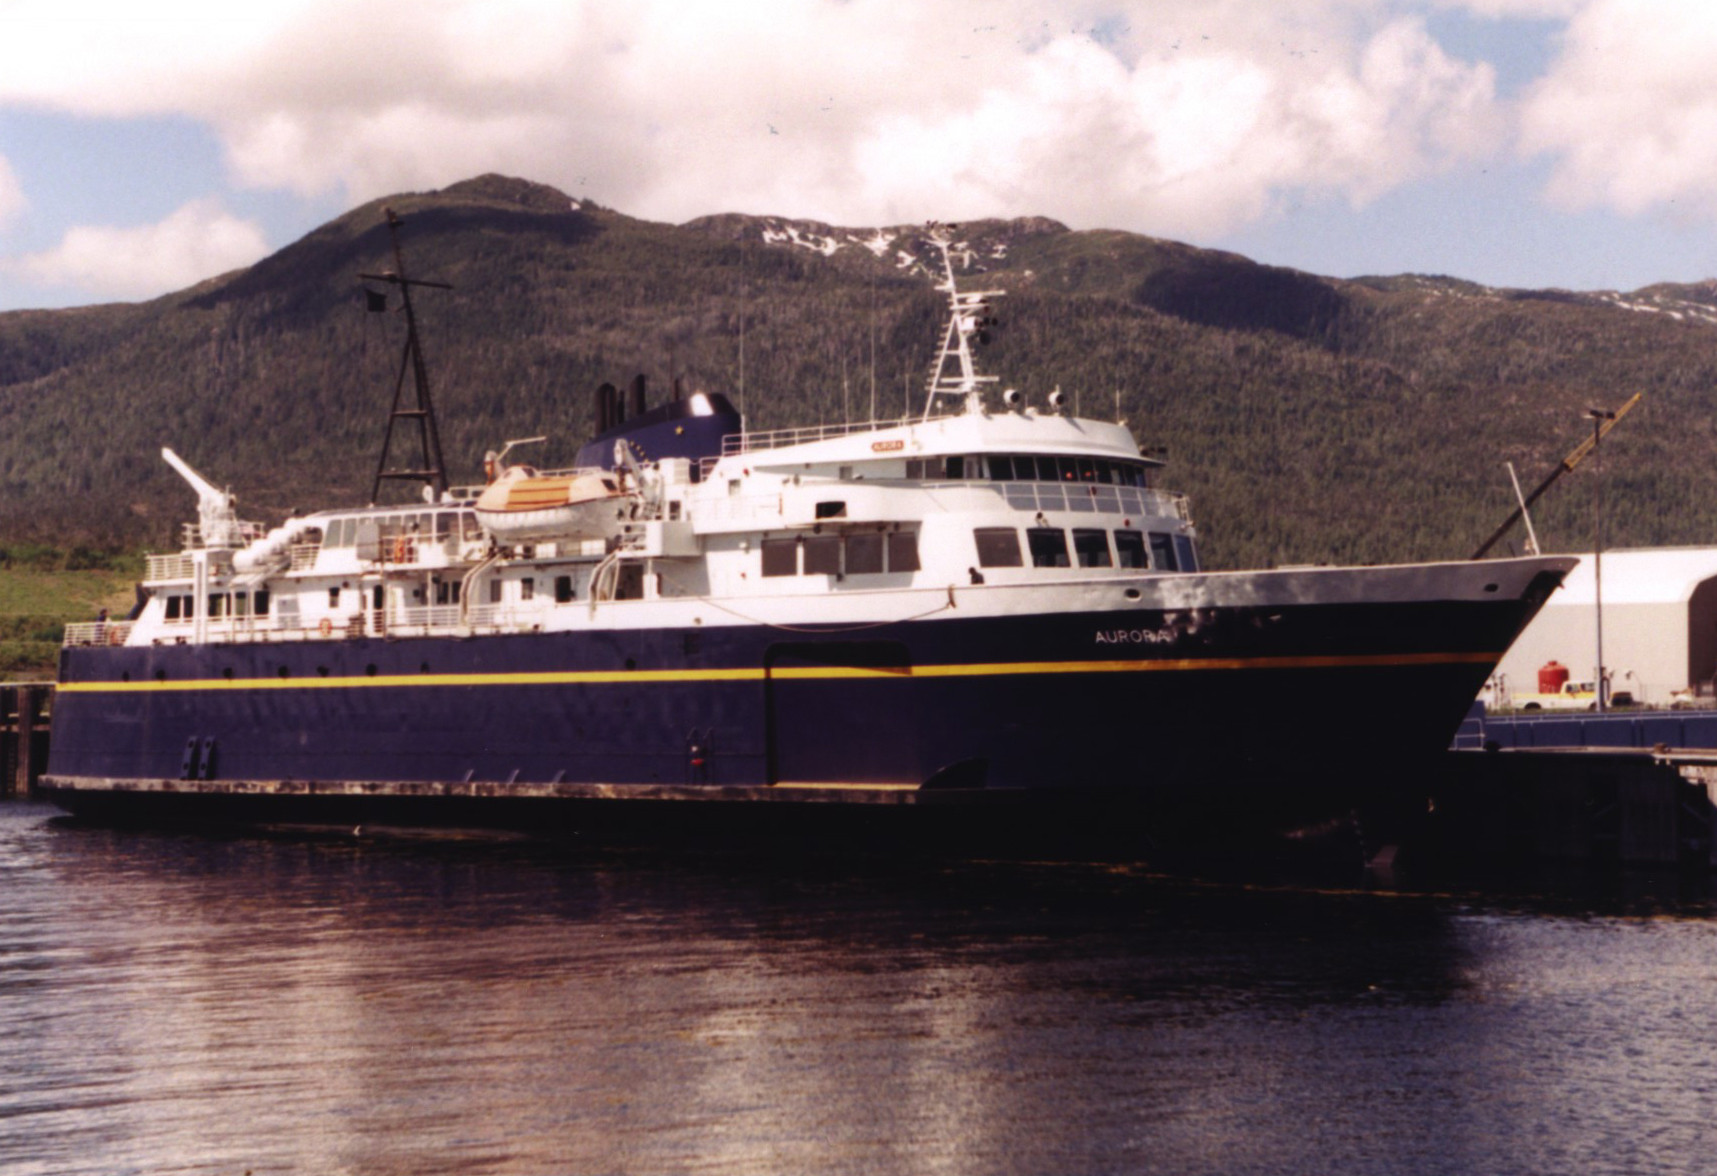 The Aurora Ferry - Alaska Marine Highway